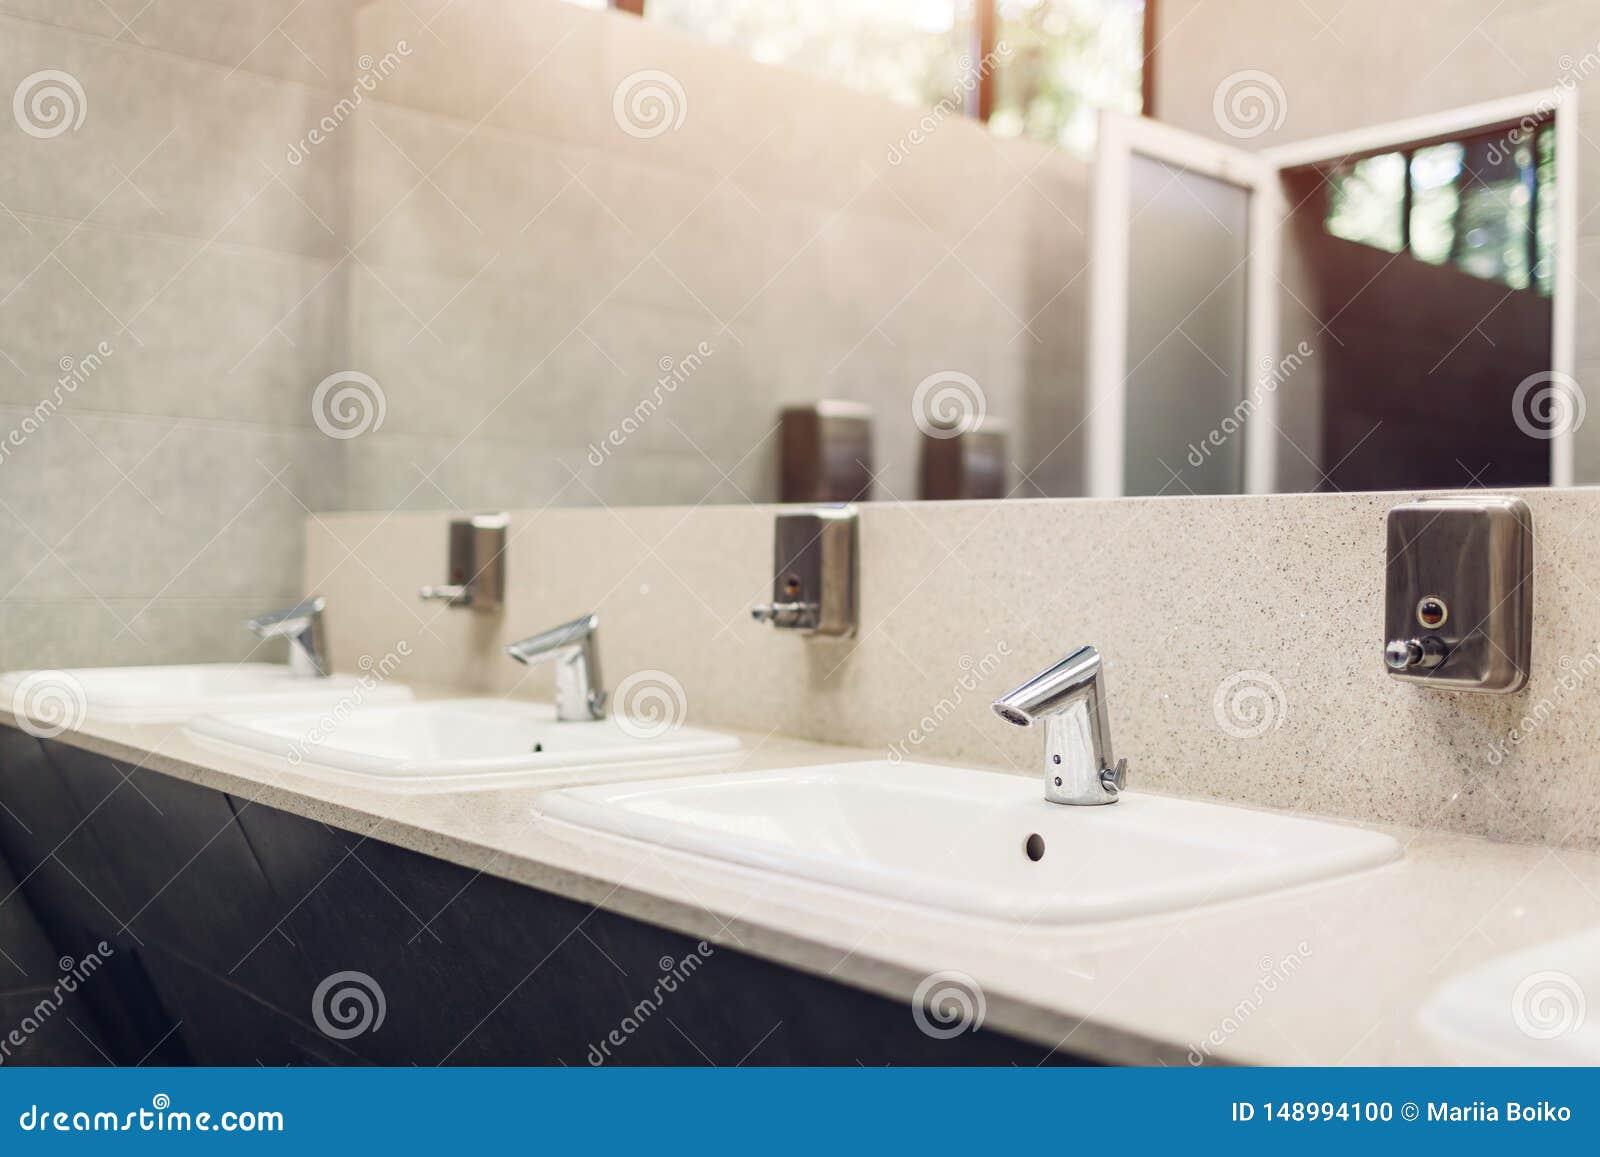 . Modern Interior Design In Public Toilet  New Sinks  Taps With Mirror